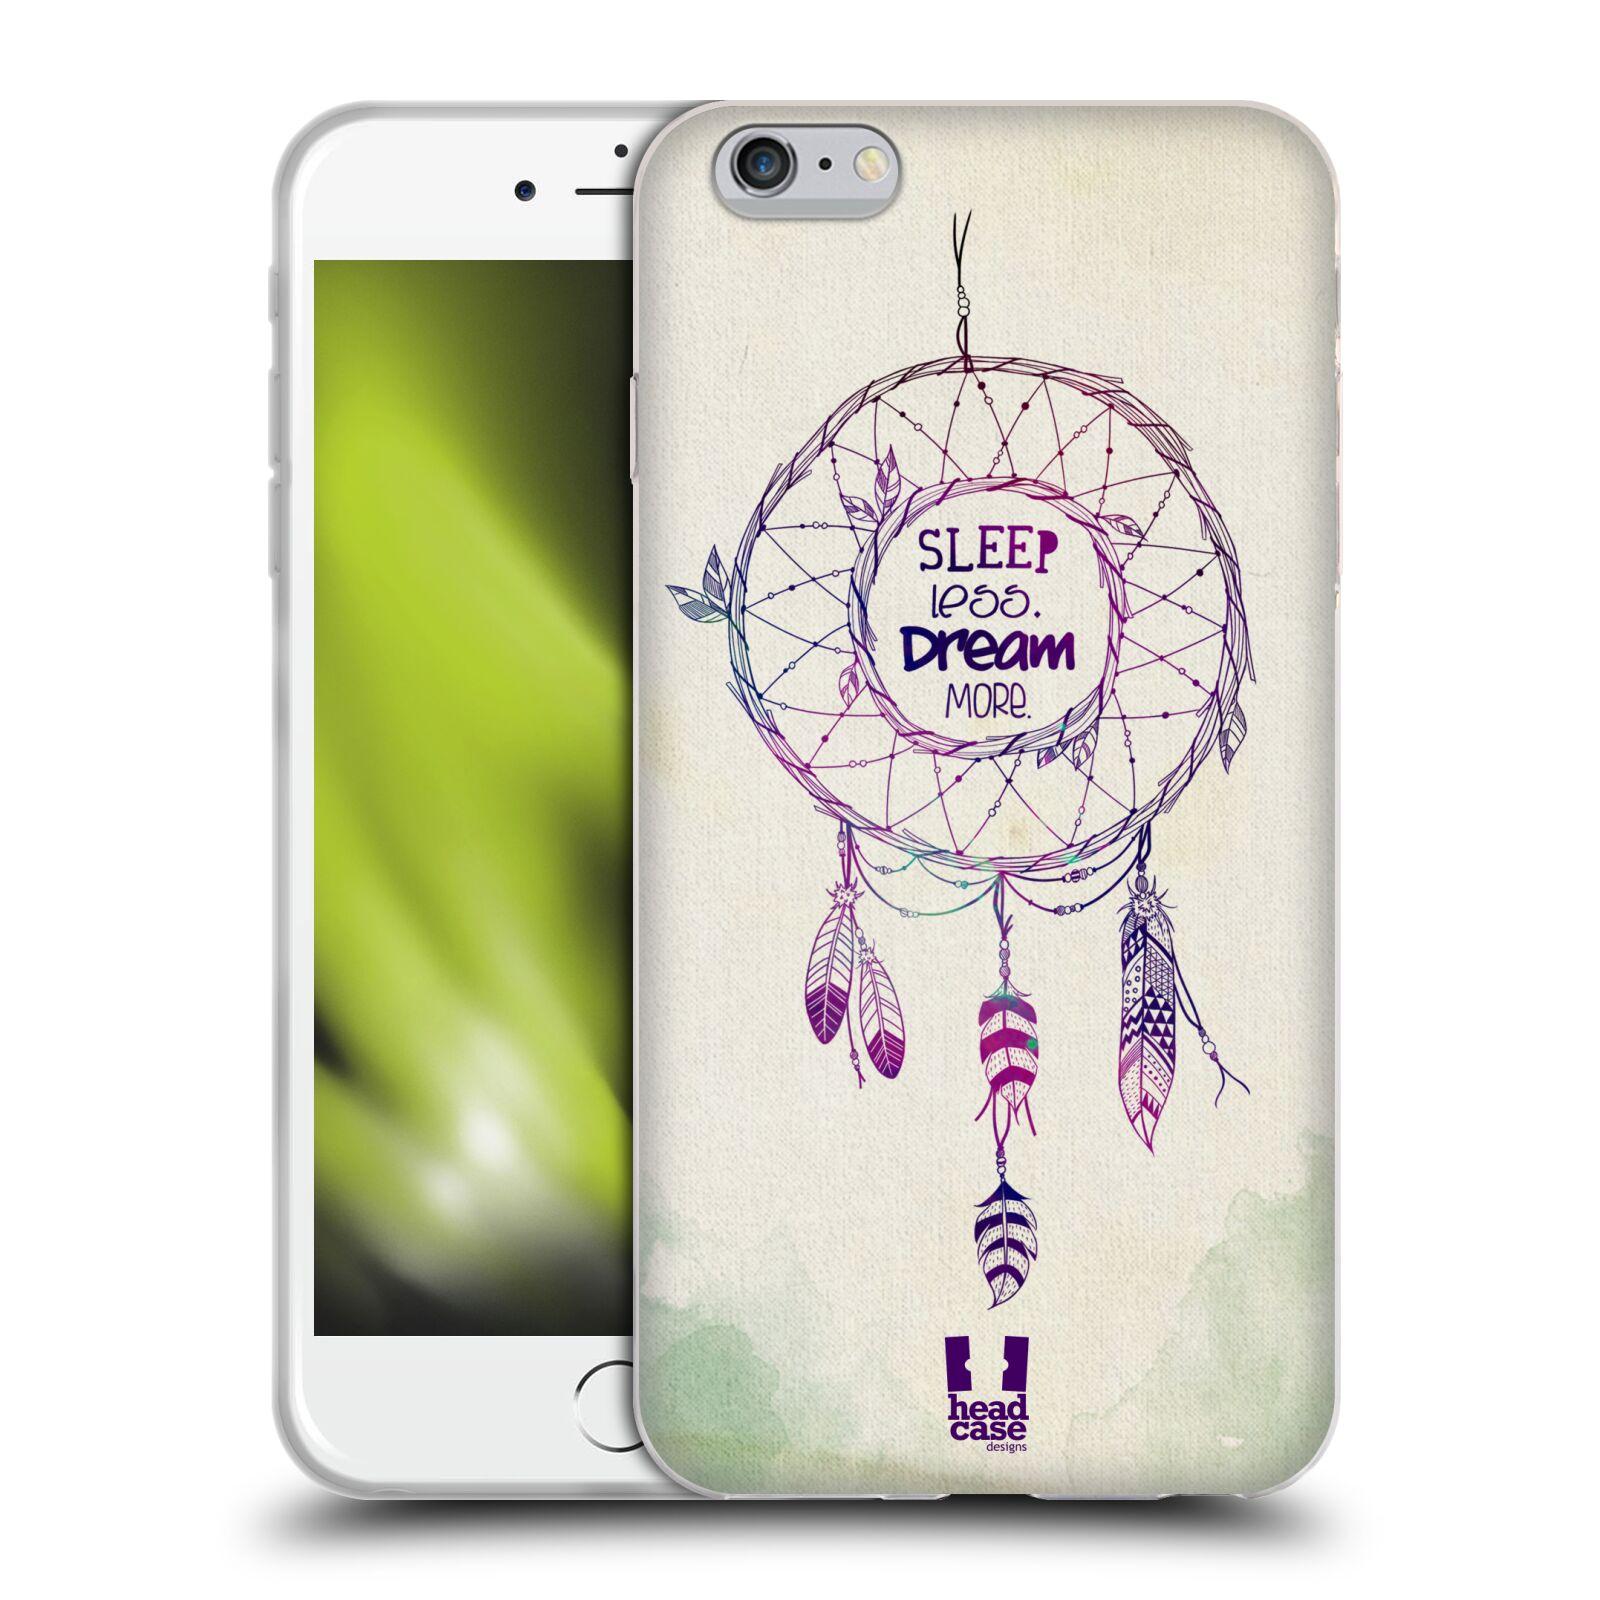 HEAD CASE silikonový obal na mobil Apple Iphone 6 PLUS/ 6S PLUS vzor Lapač snů ZELENÁ A FIALOVÁ